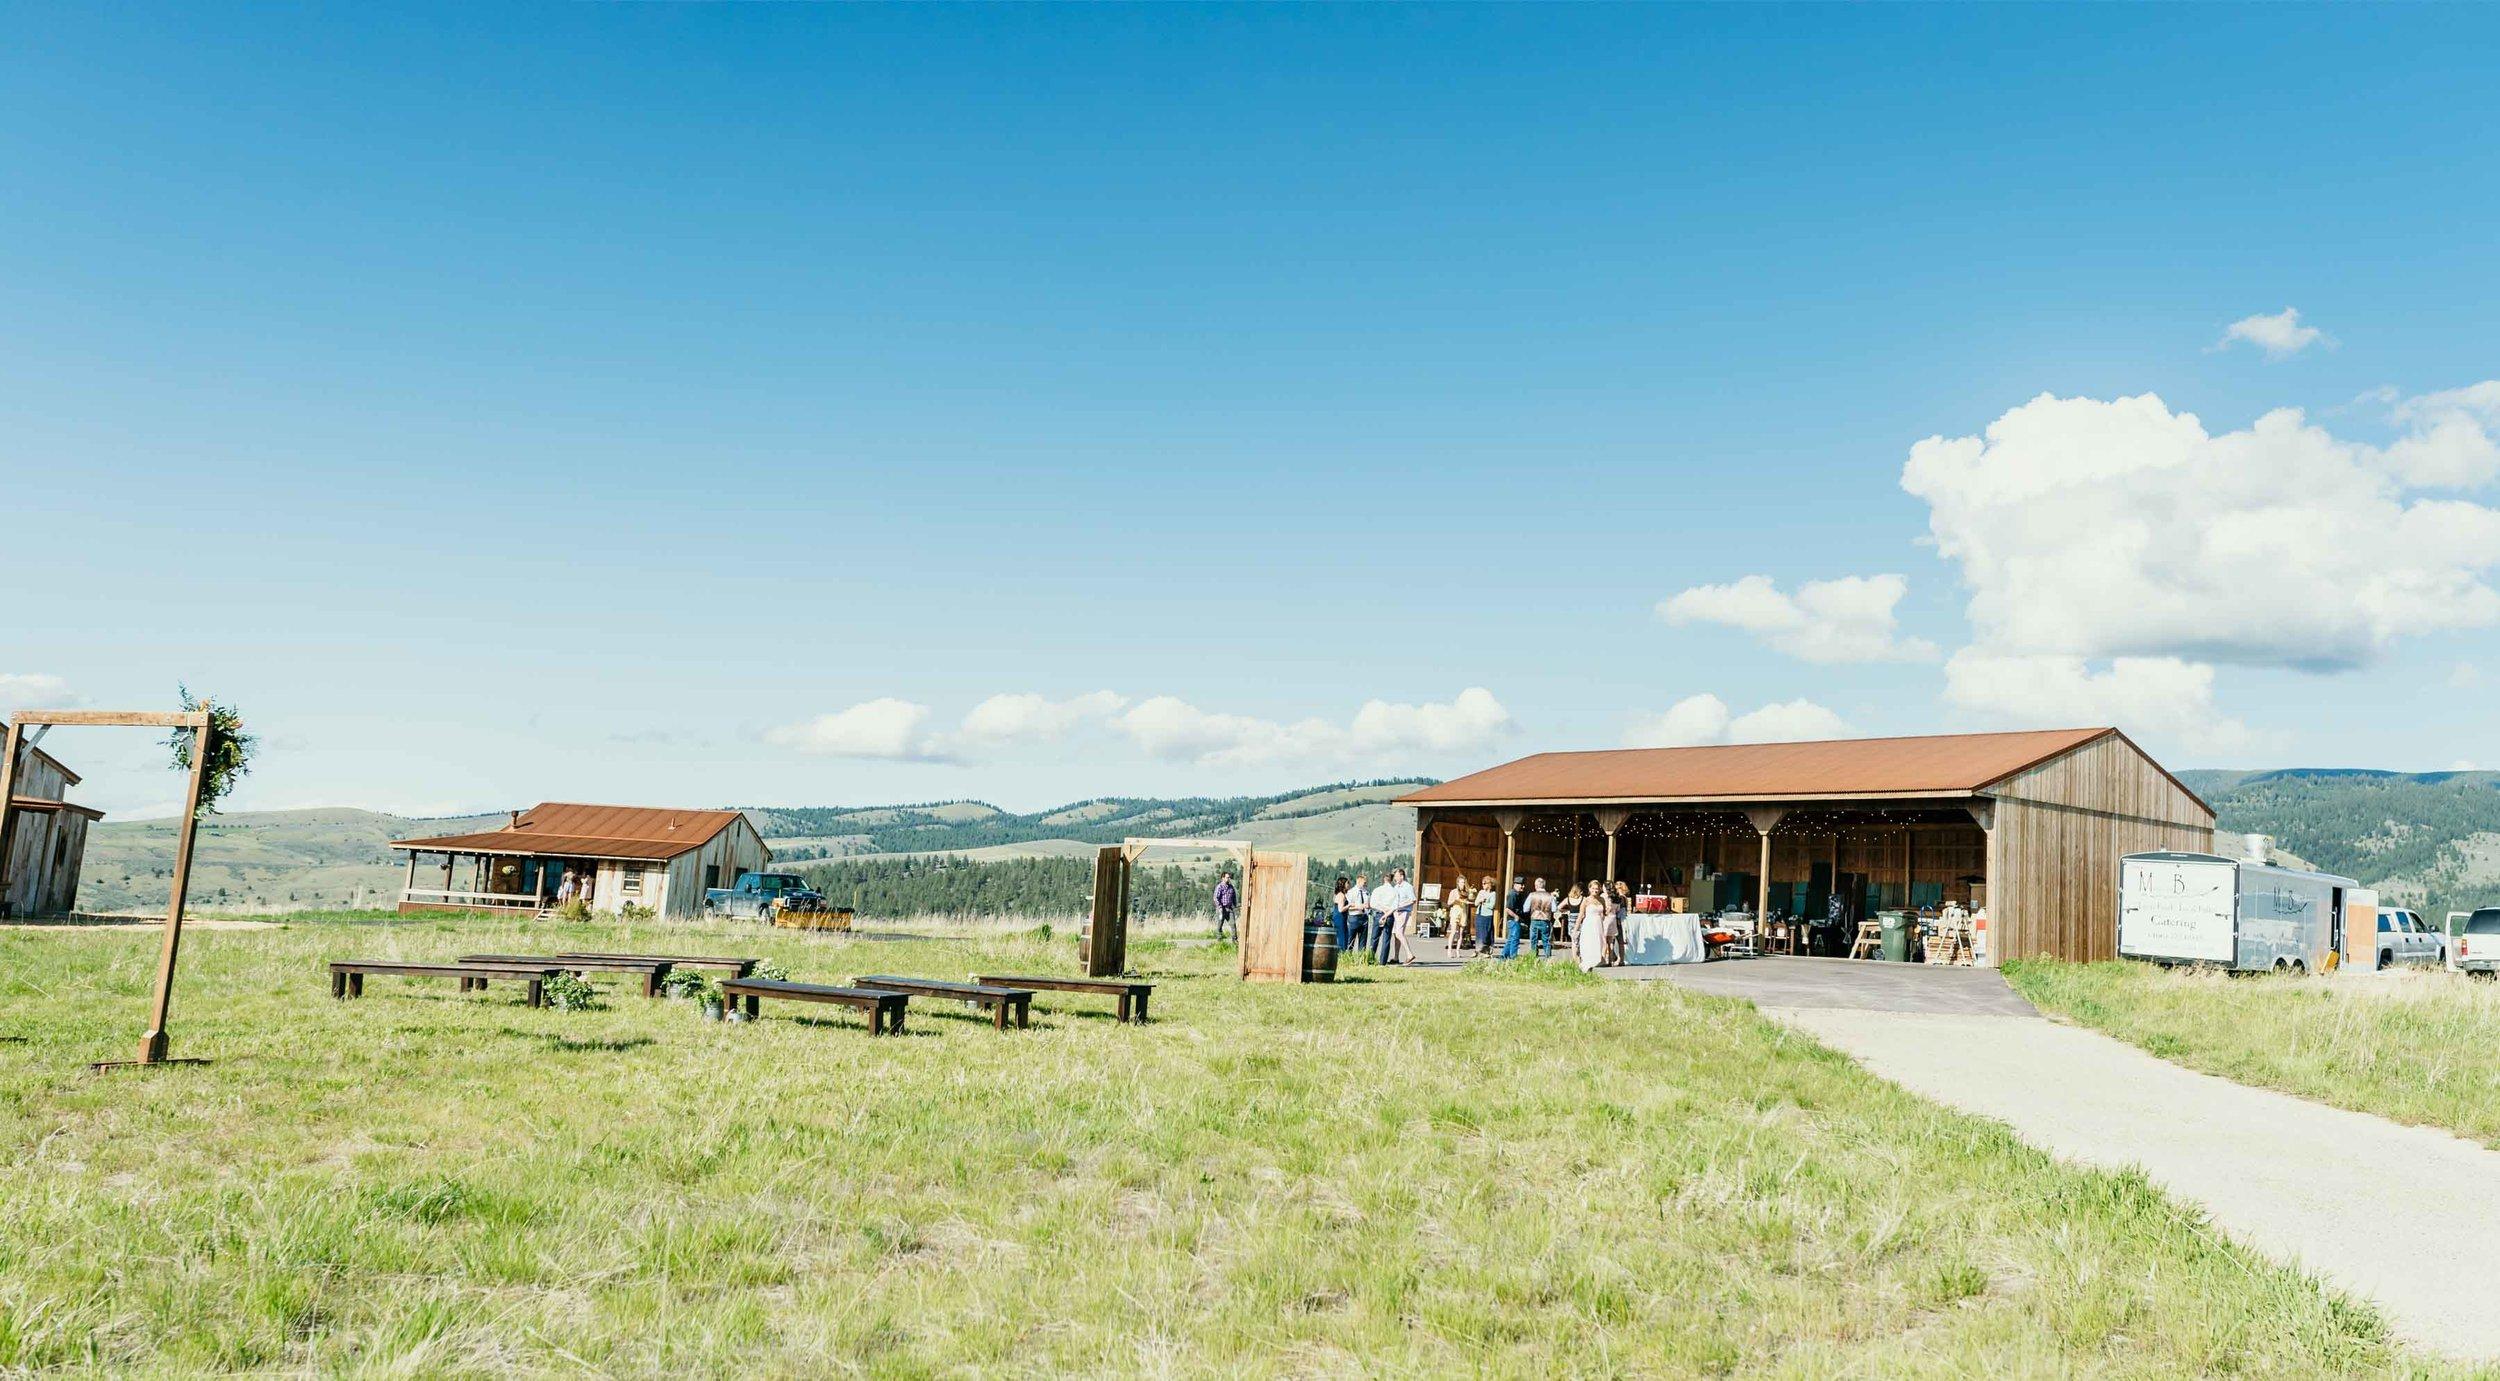 407 Montana Wedding Photographer_Doherty 2018-2087-Pano.jpg